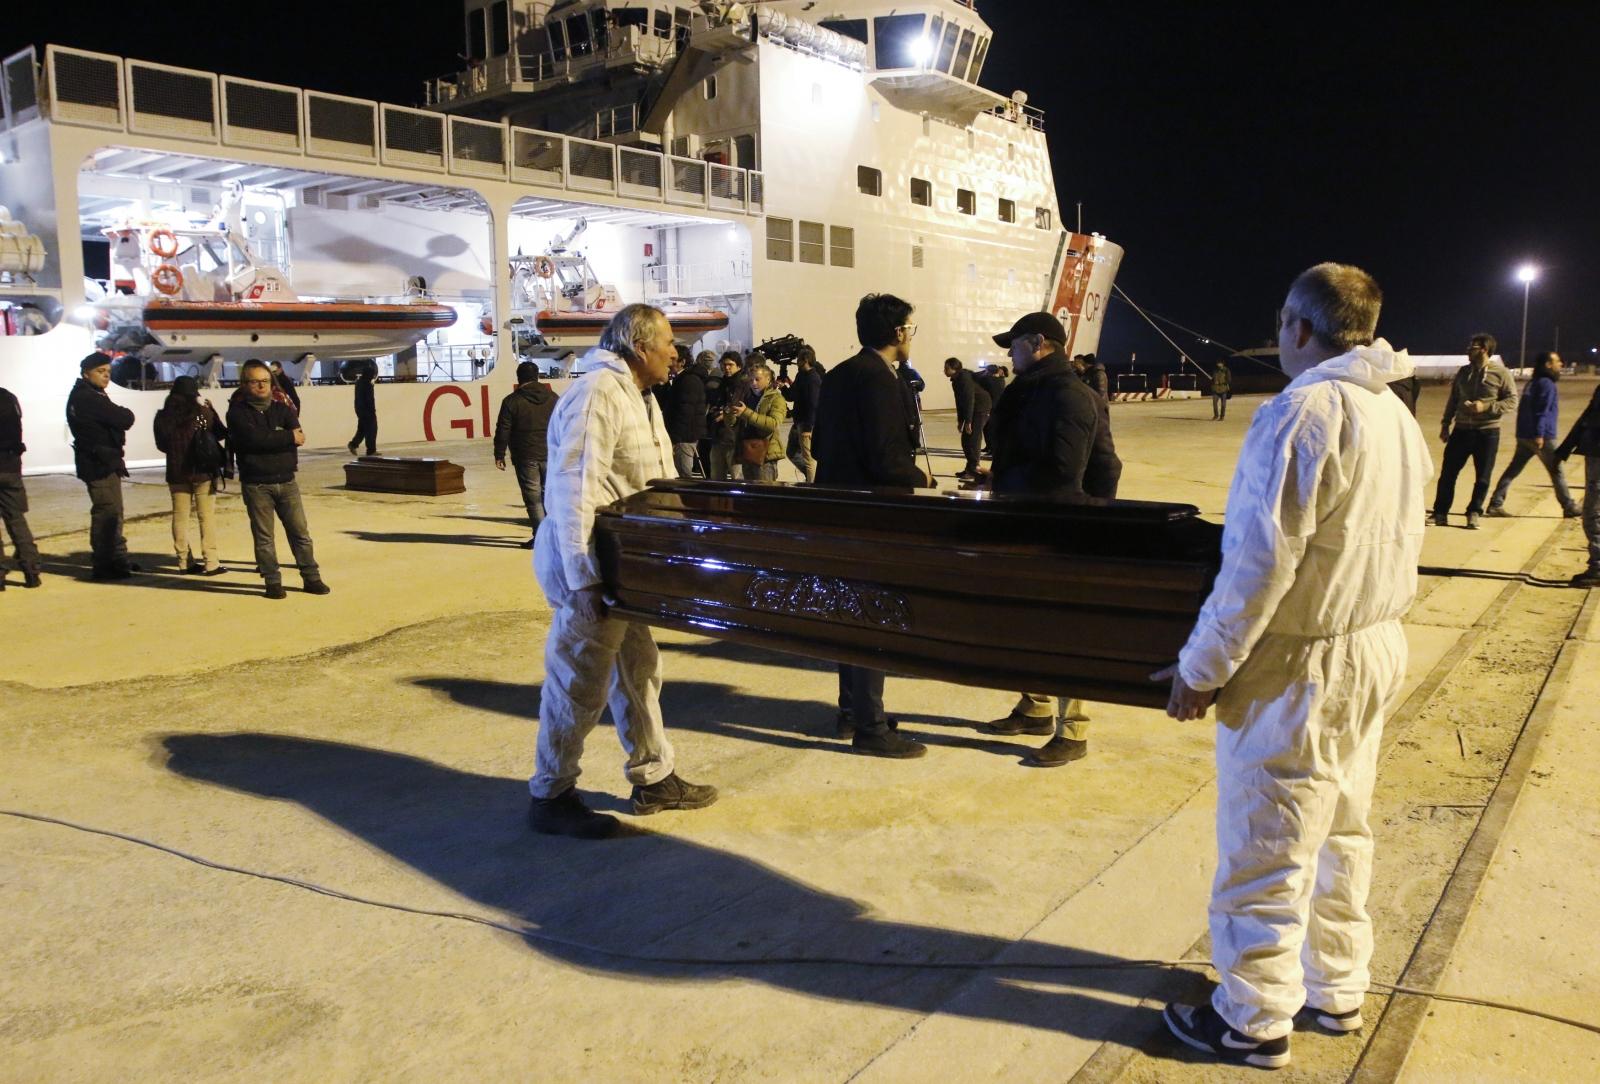 Mediterranean migrants drown